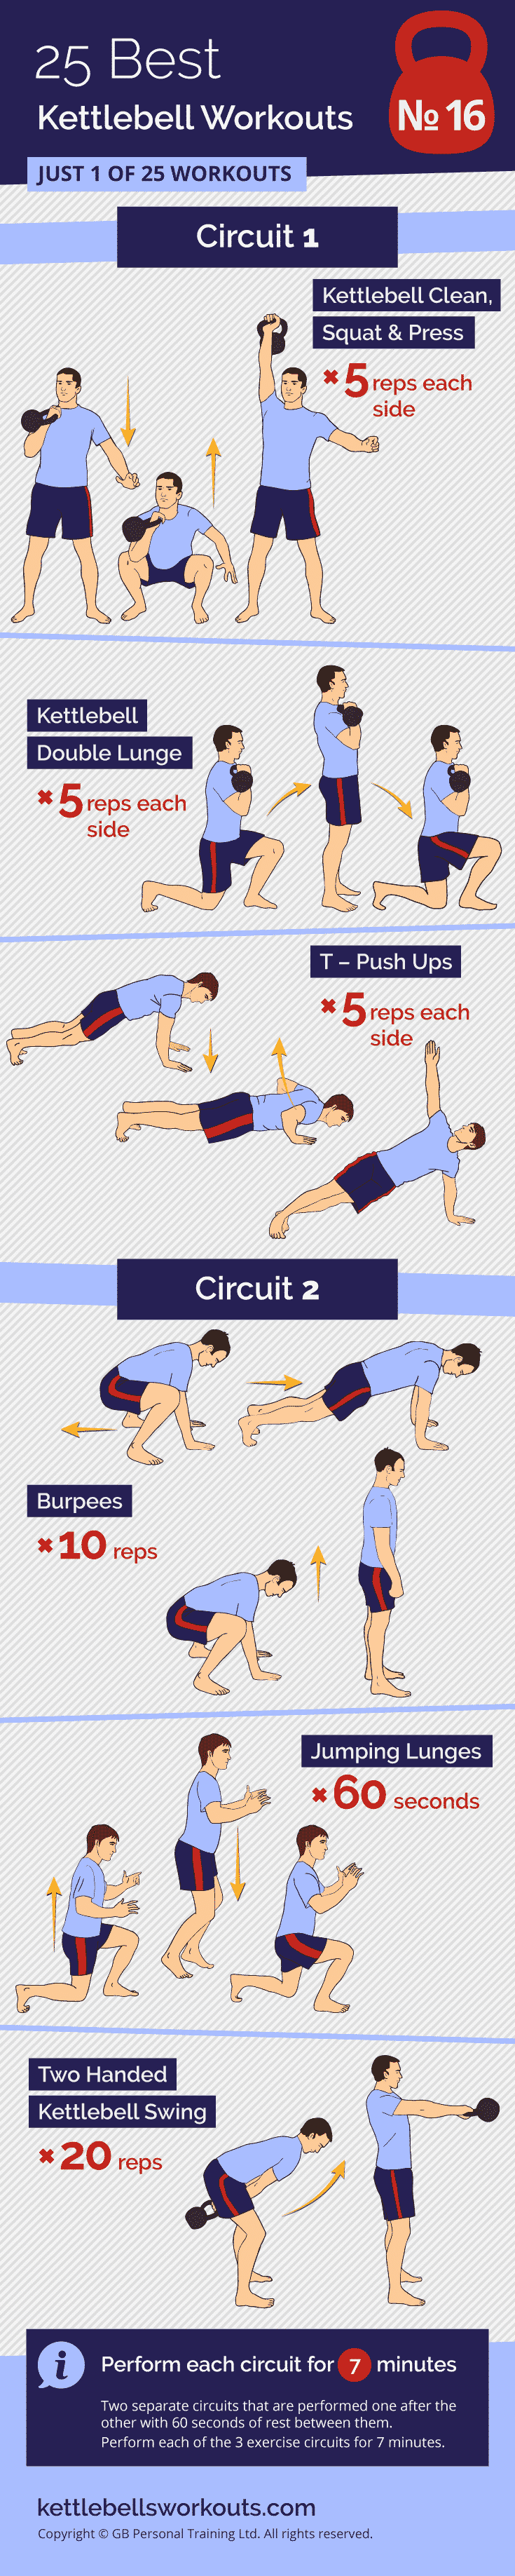 2 x 7 Minute Kettlebell Circuits v3